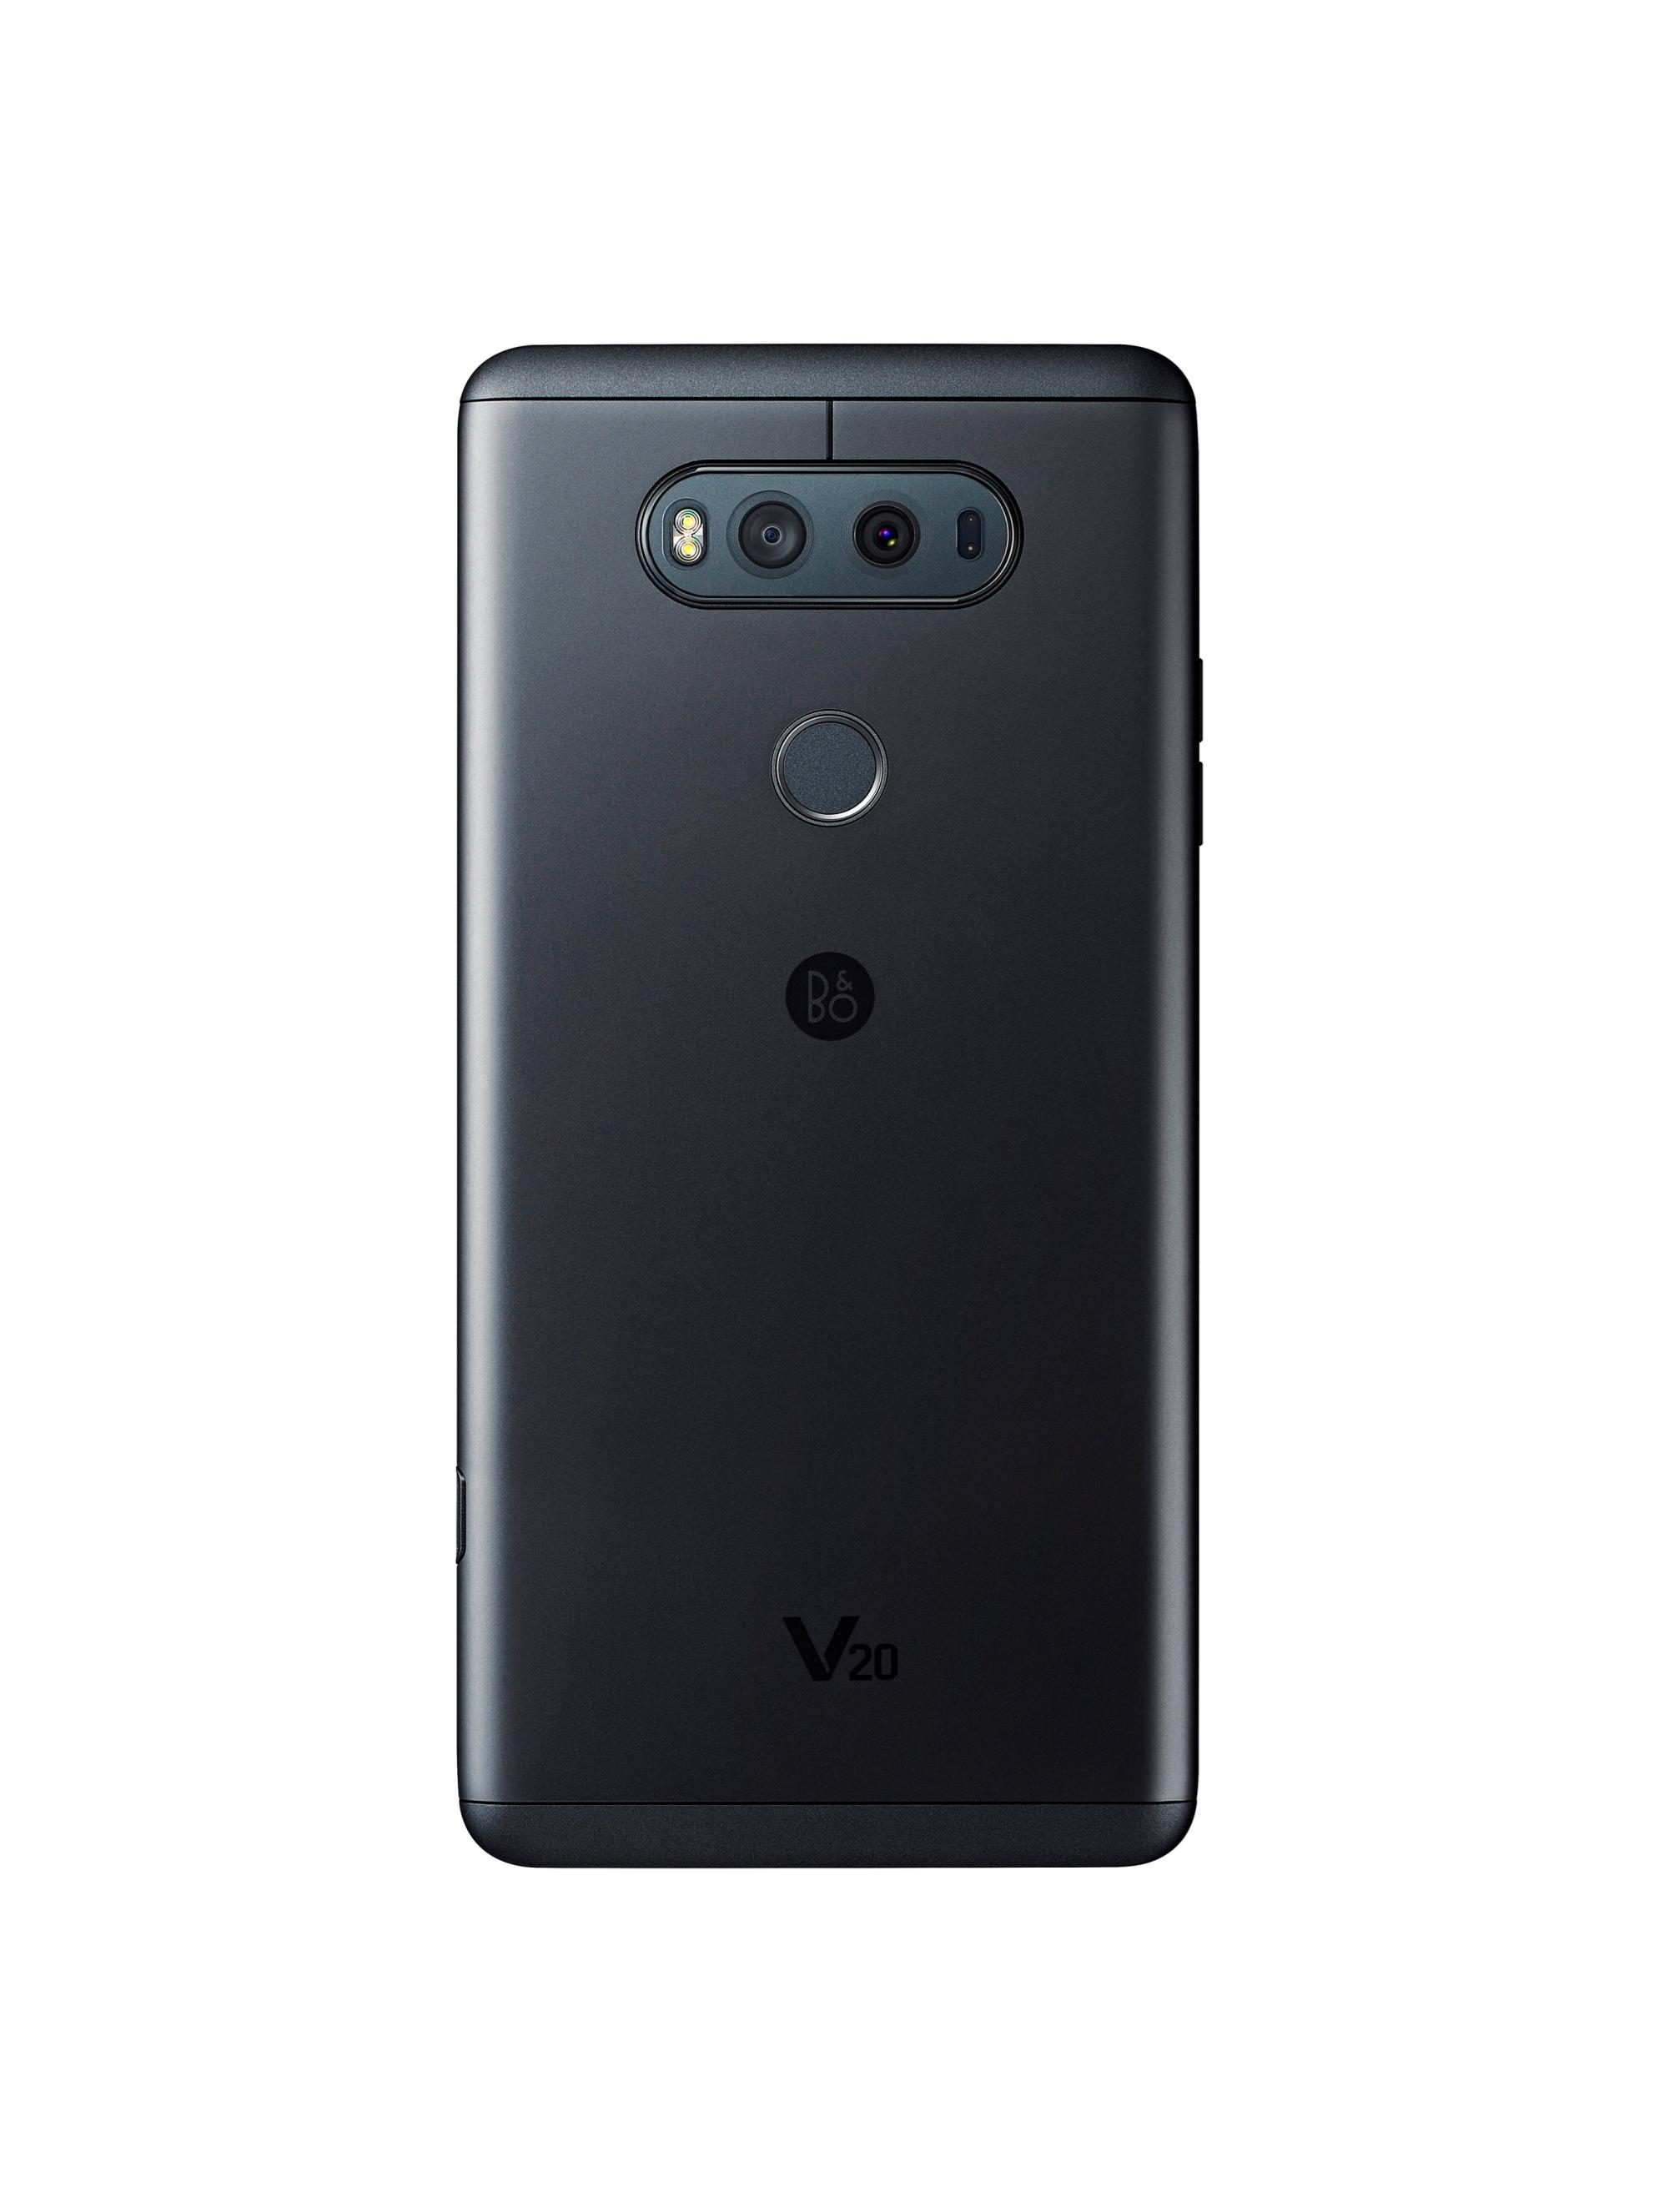 LG V20在台上市價NT$21,900元 11月1日四大電信正式開賣